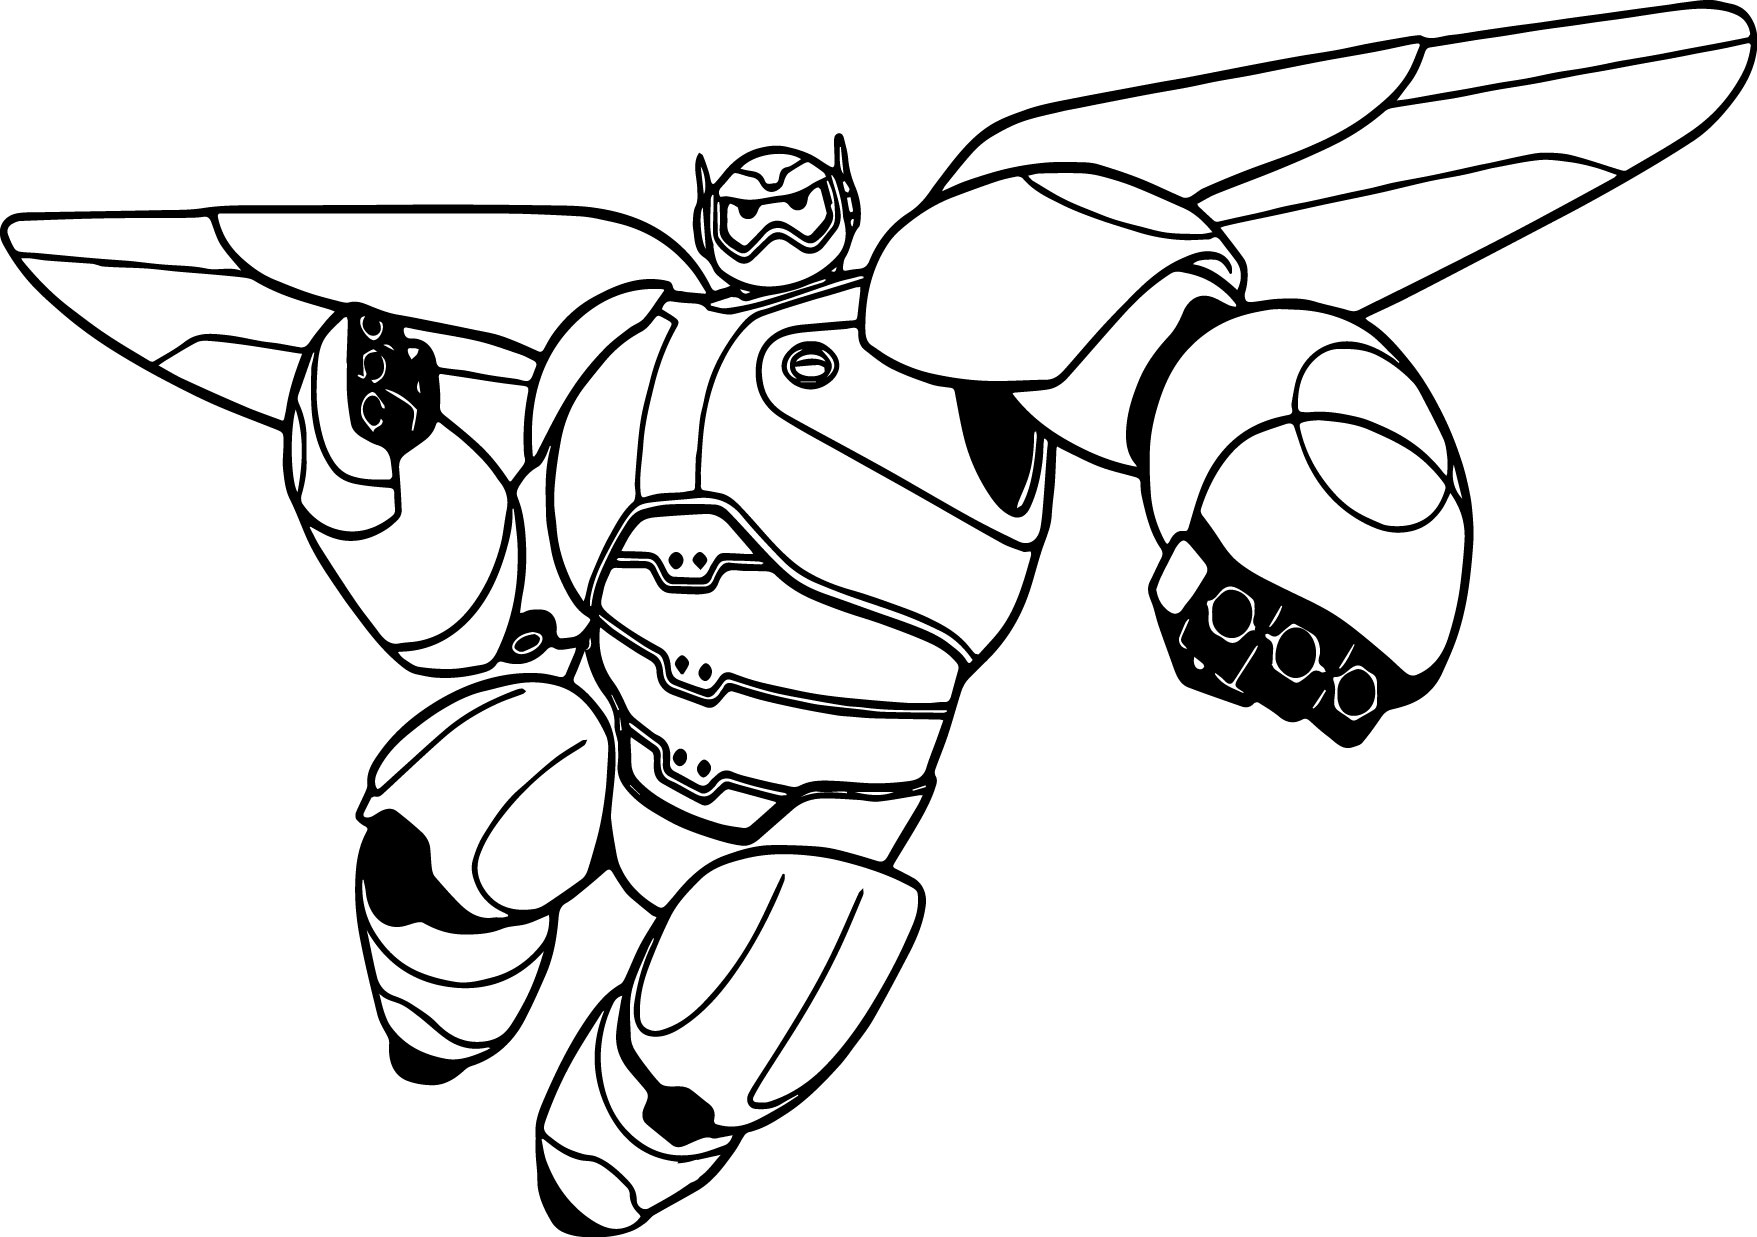 Big Hero 6 Characters Baymax Mechanic Coloring Page